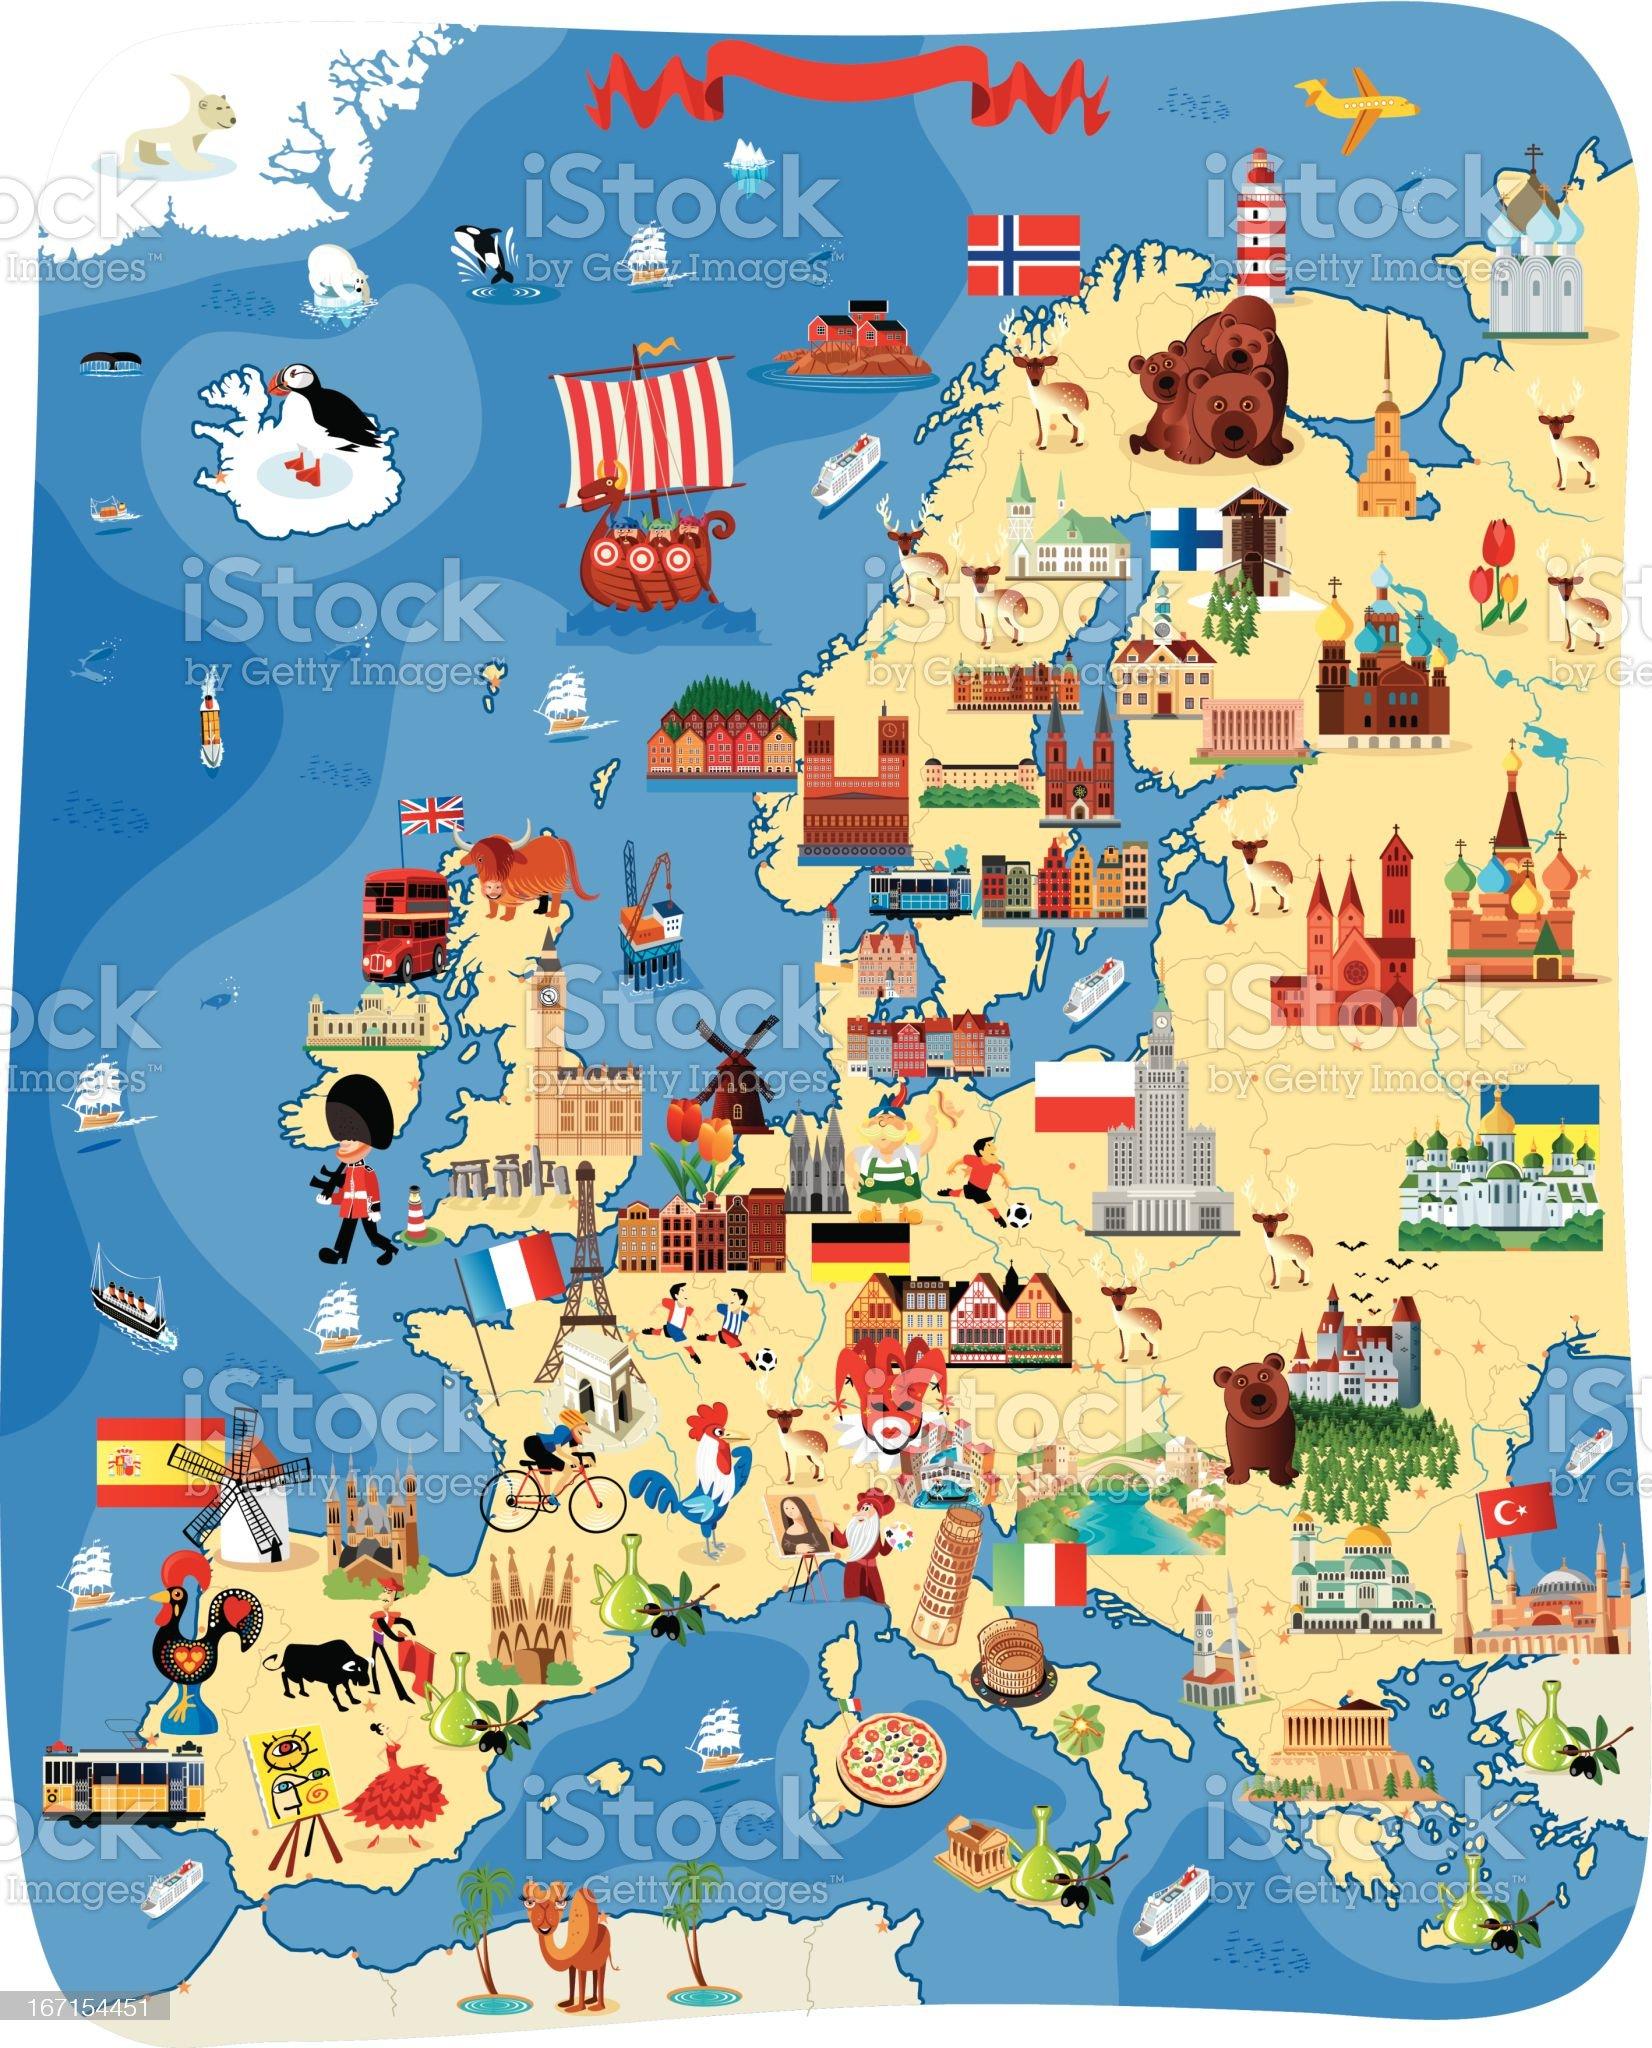 Europe Cartoon map royalty-free stock vector art